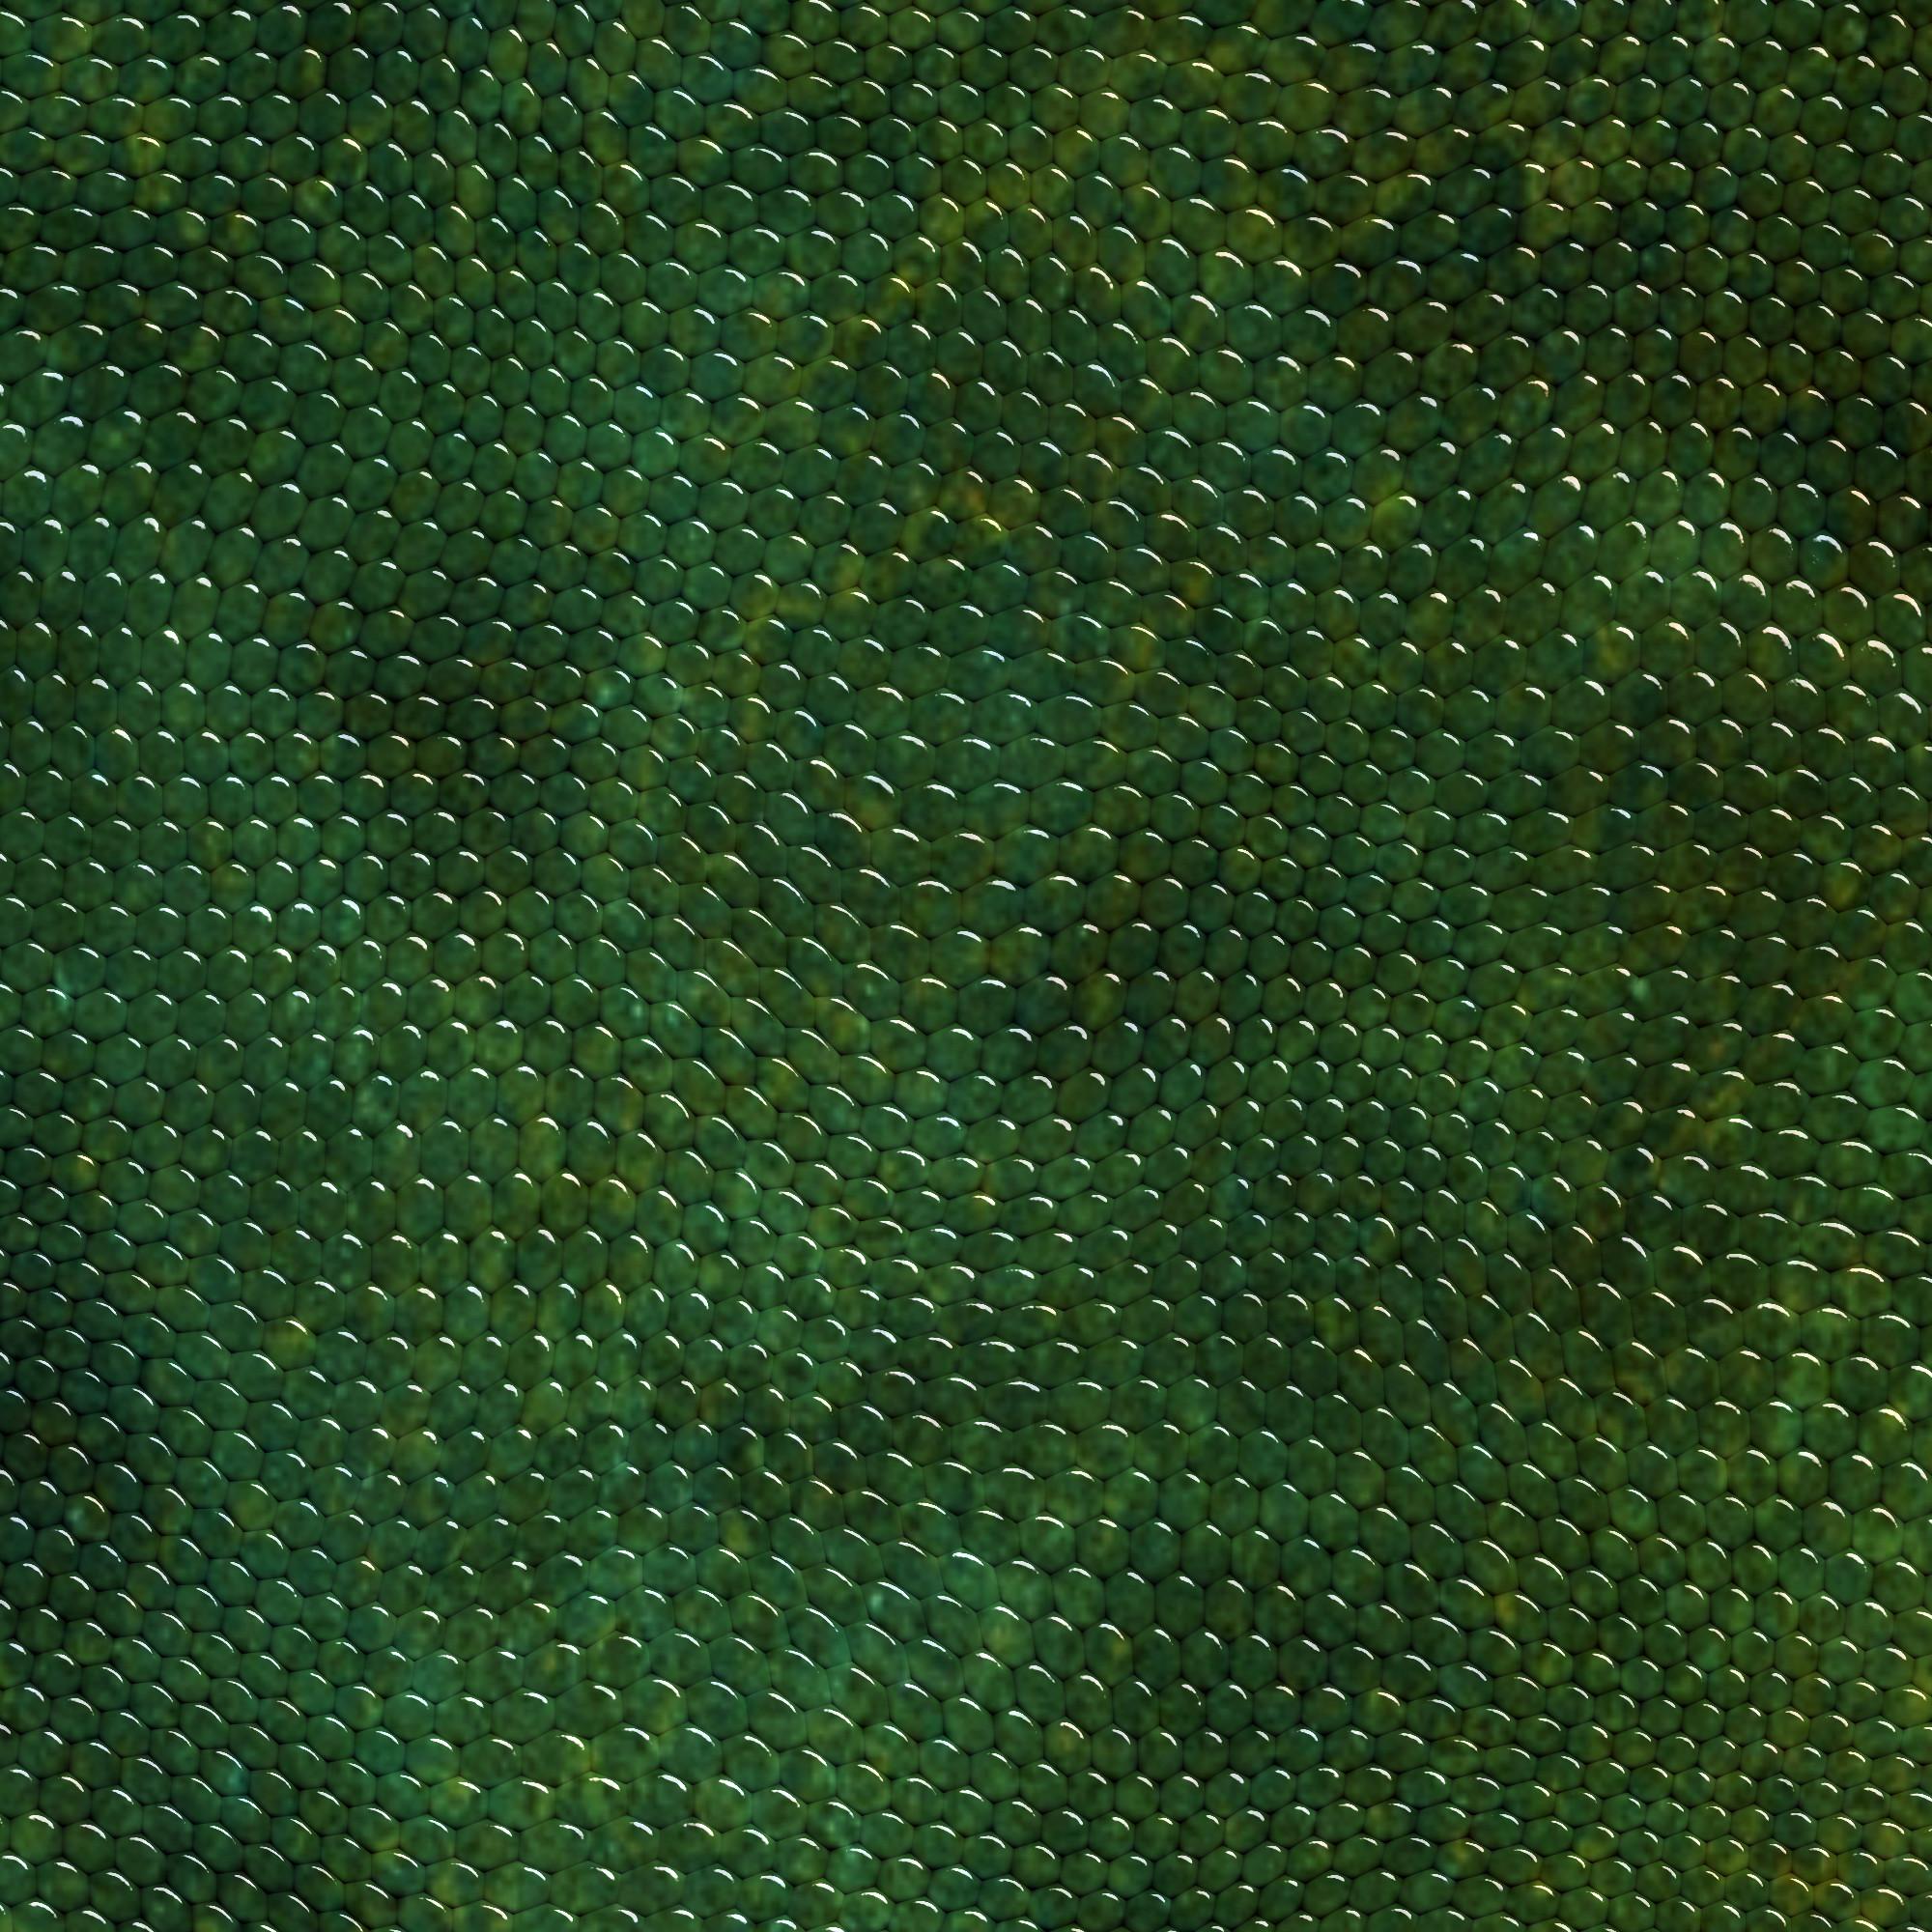 Black Snake Skin Wallpaper 55 Images